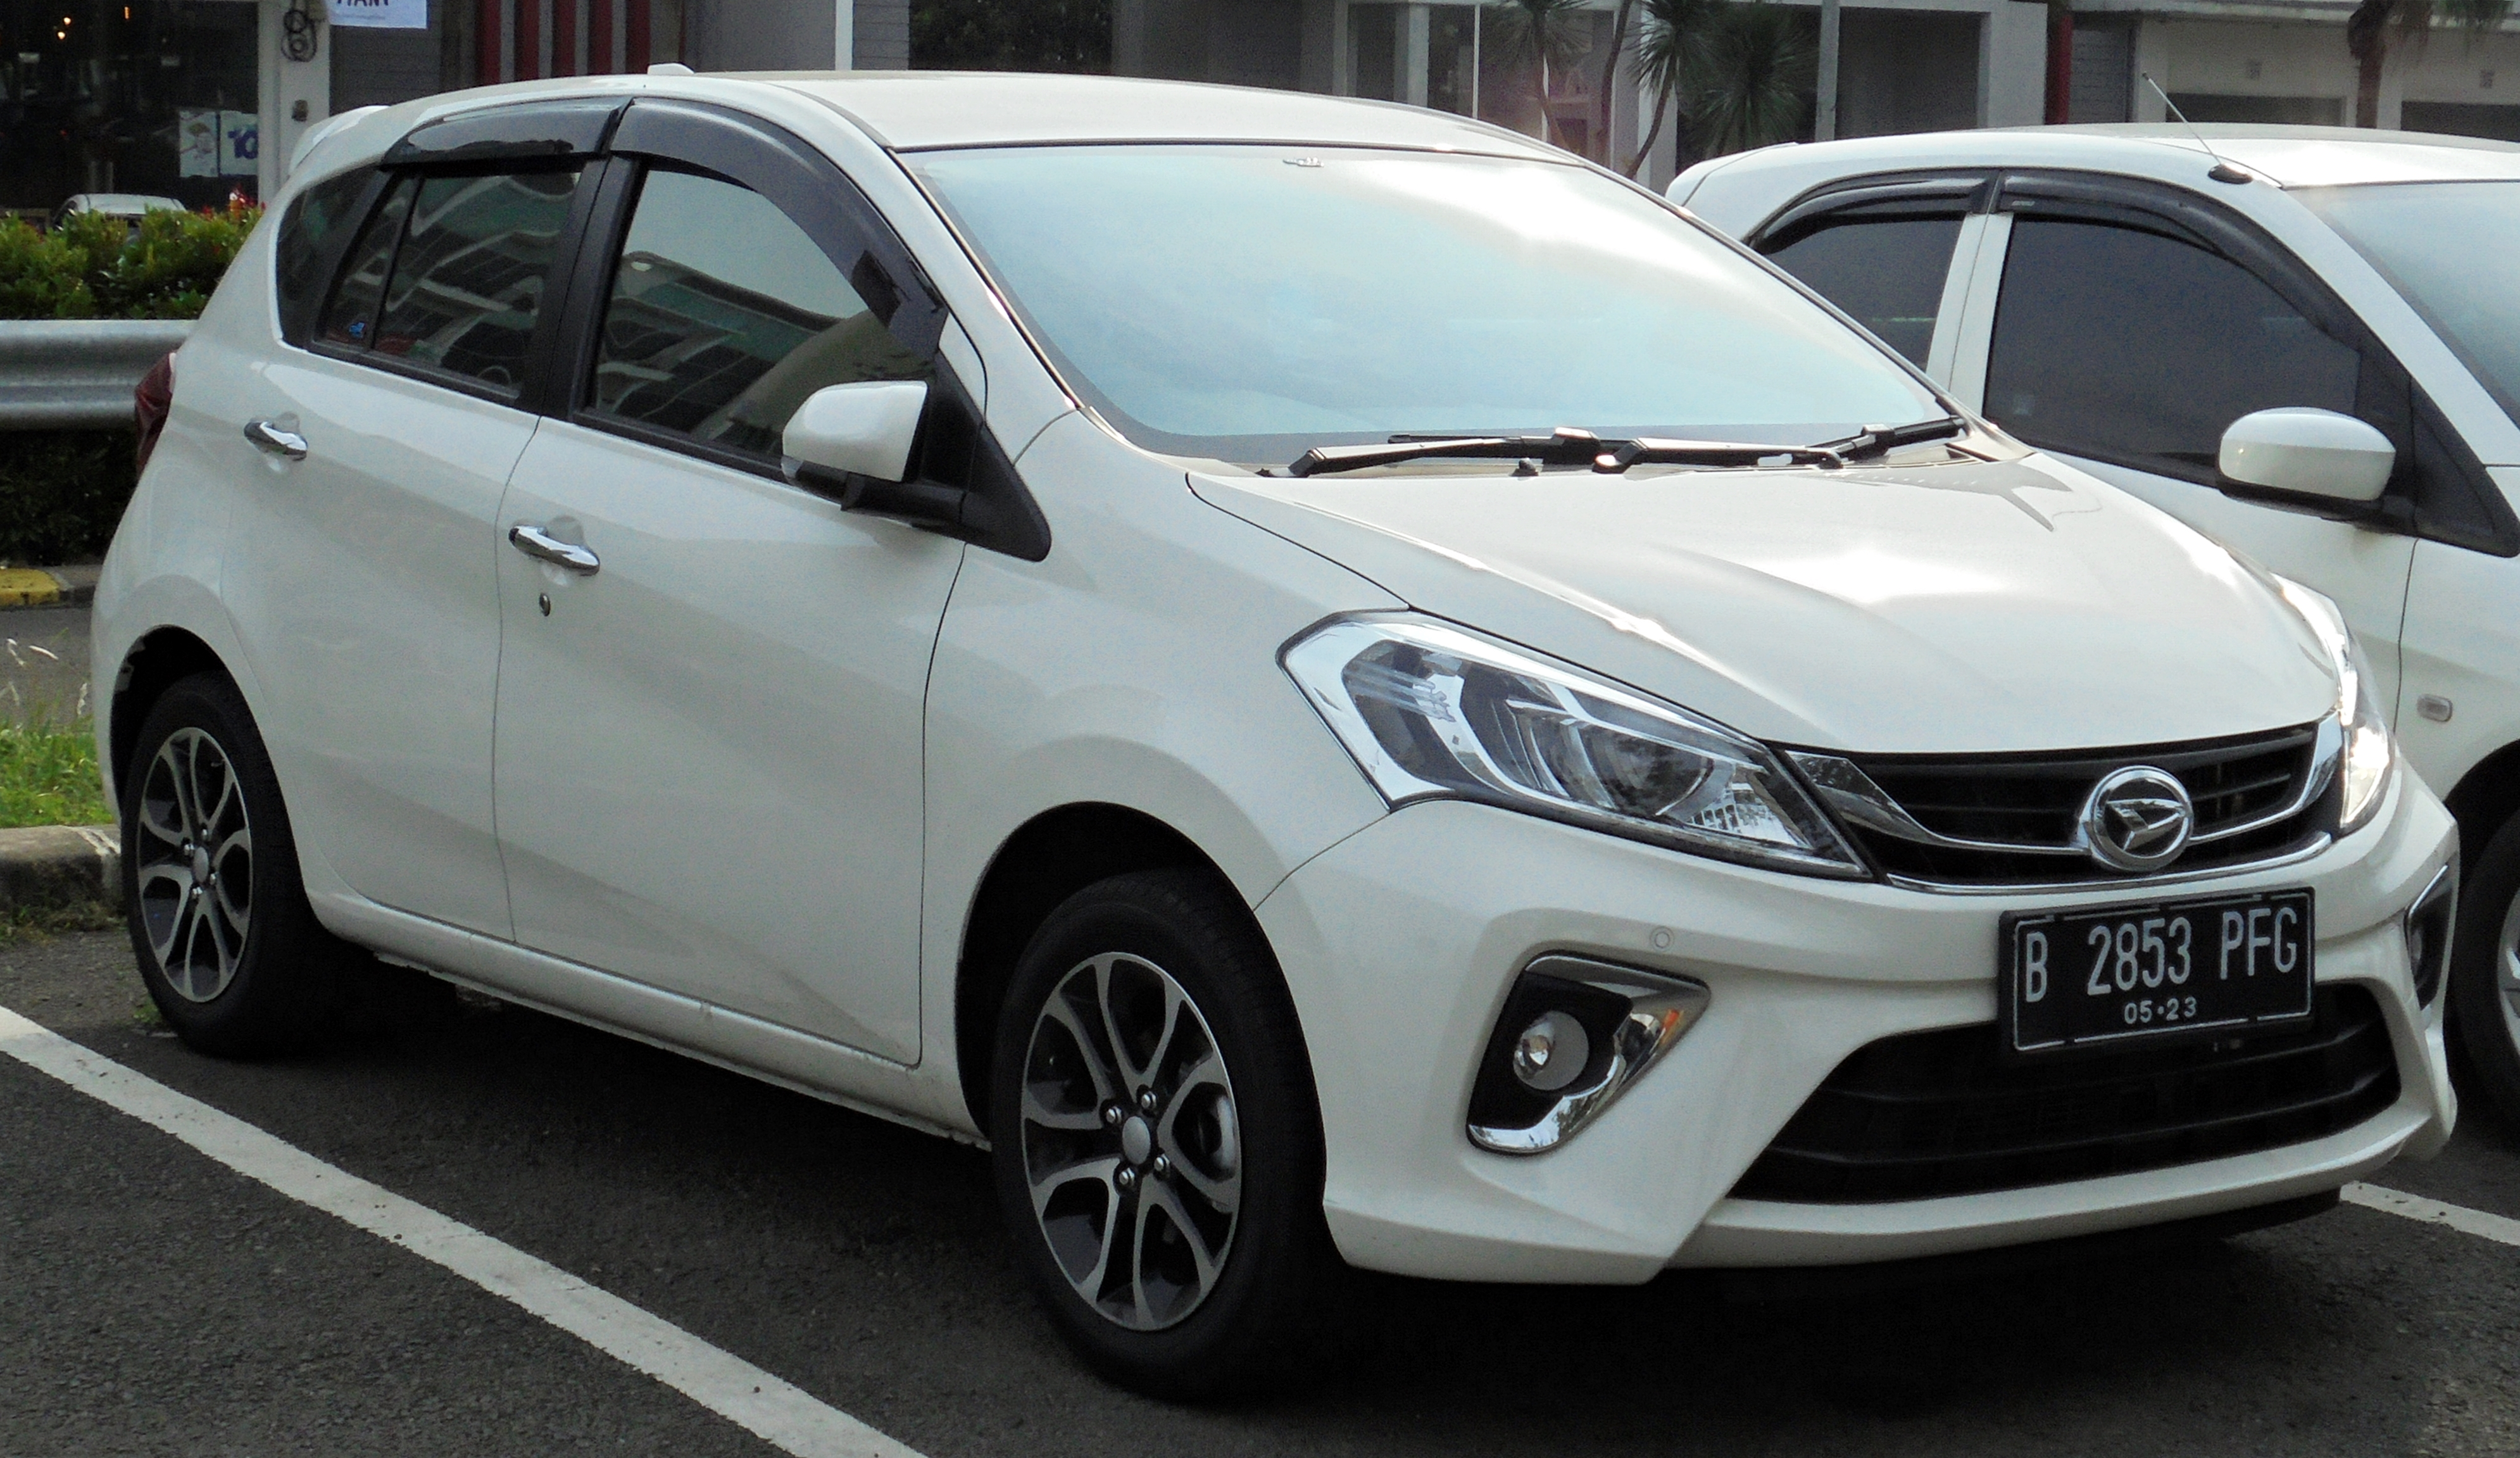 File:2018 Daihatsu Sirion 1.3 Hatchback (M804RS; 12-22